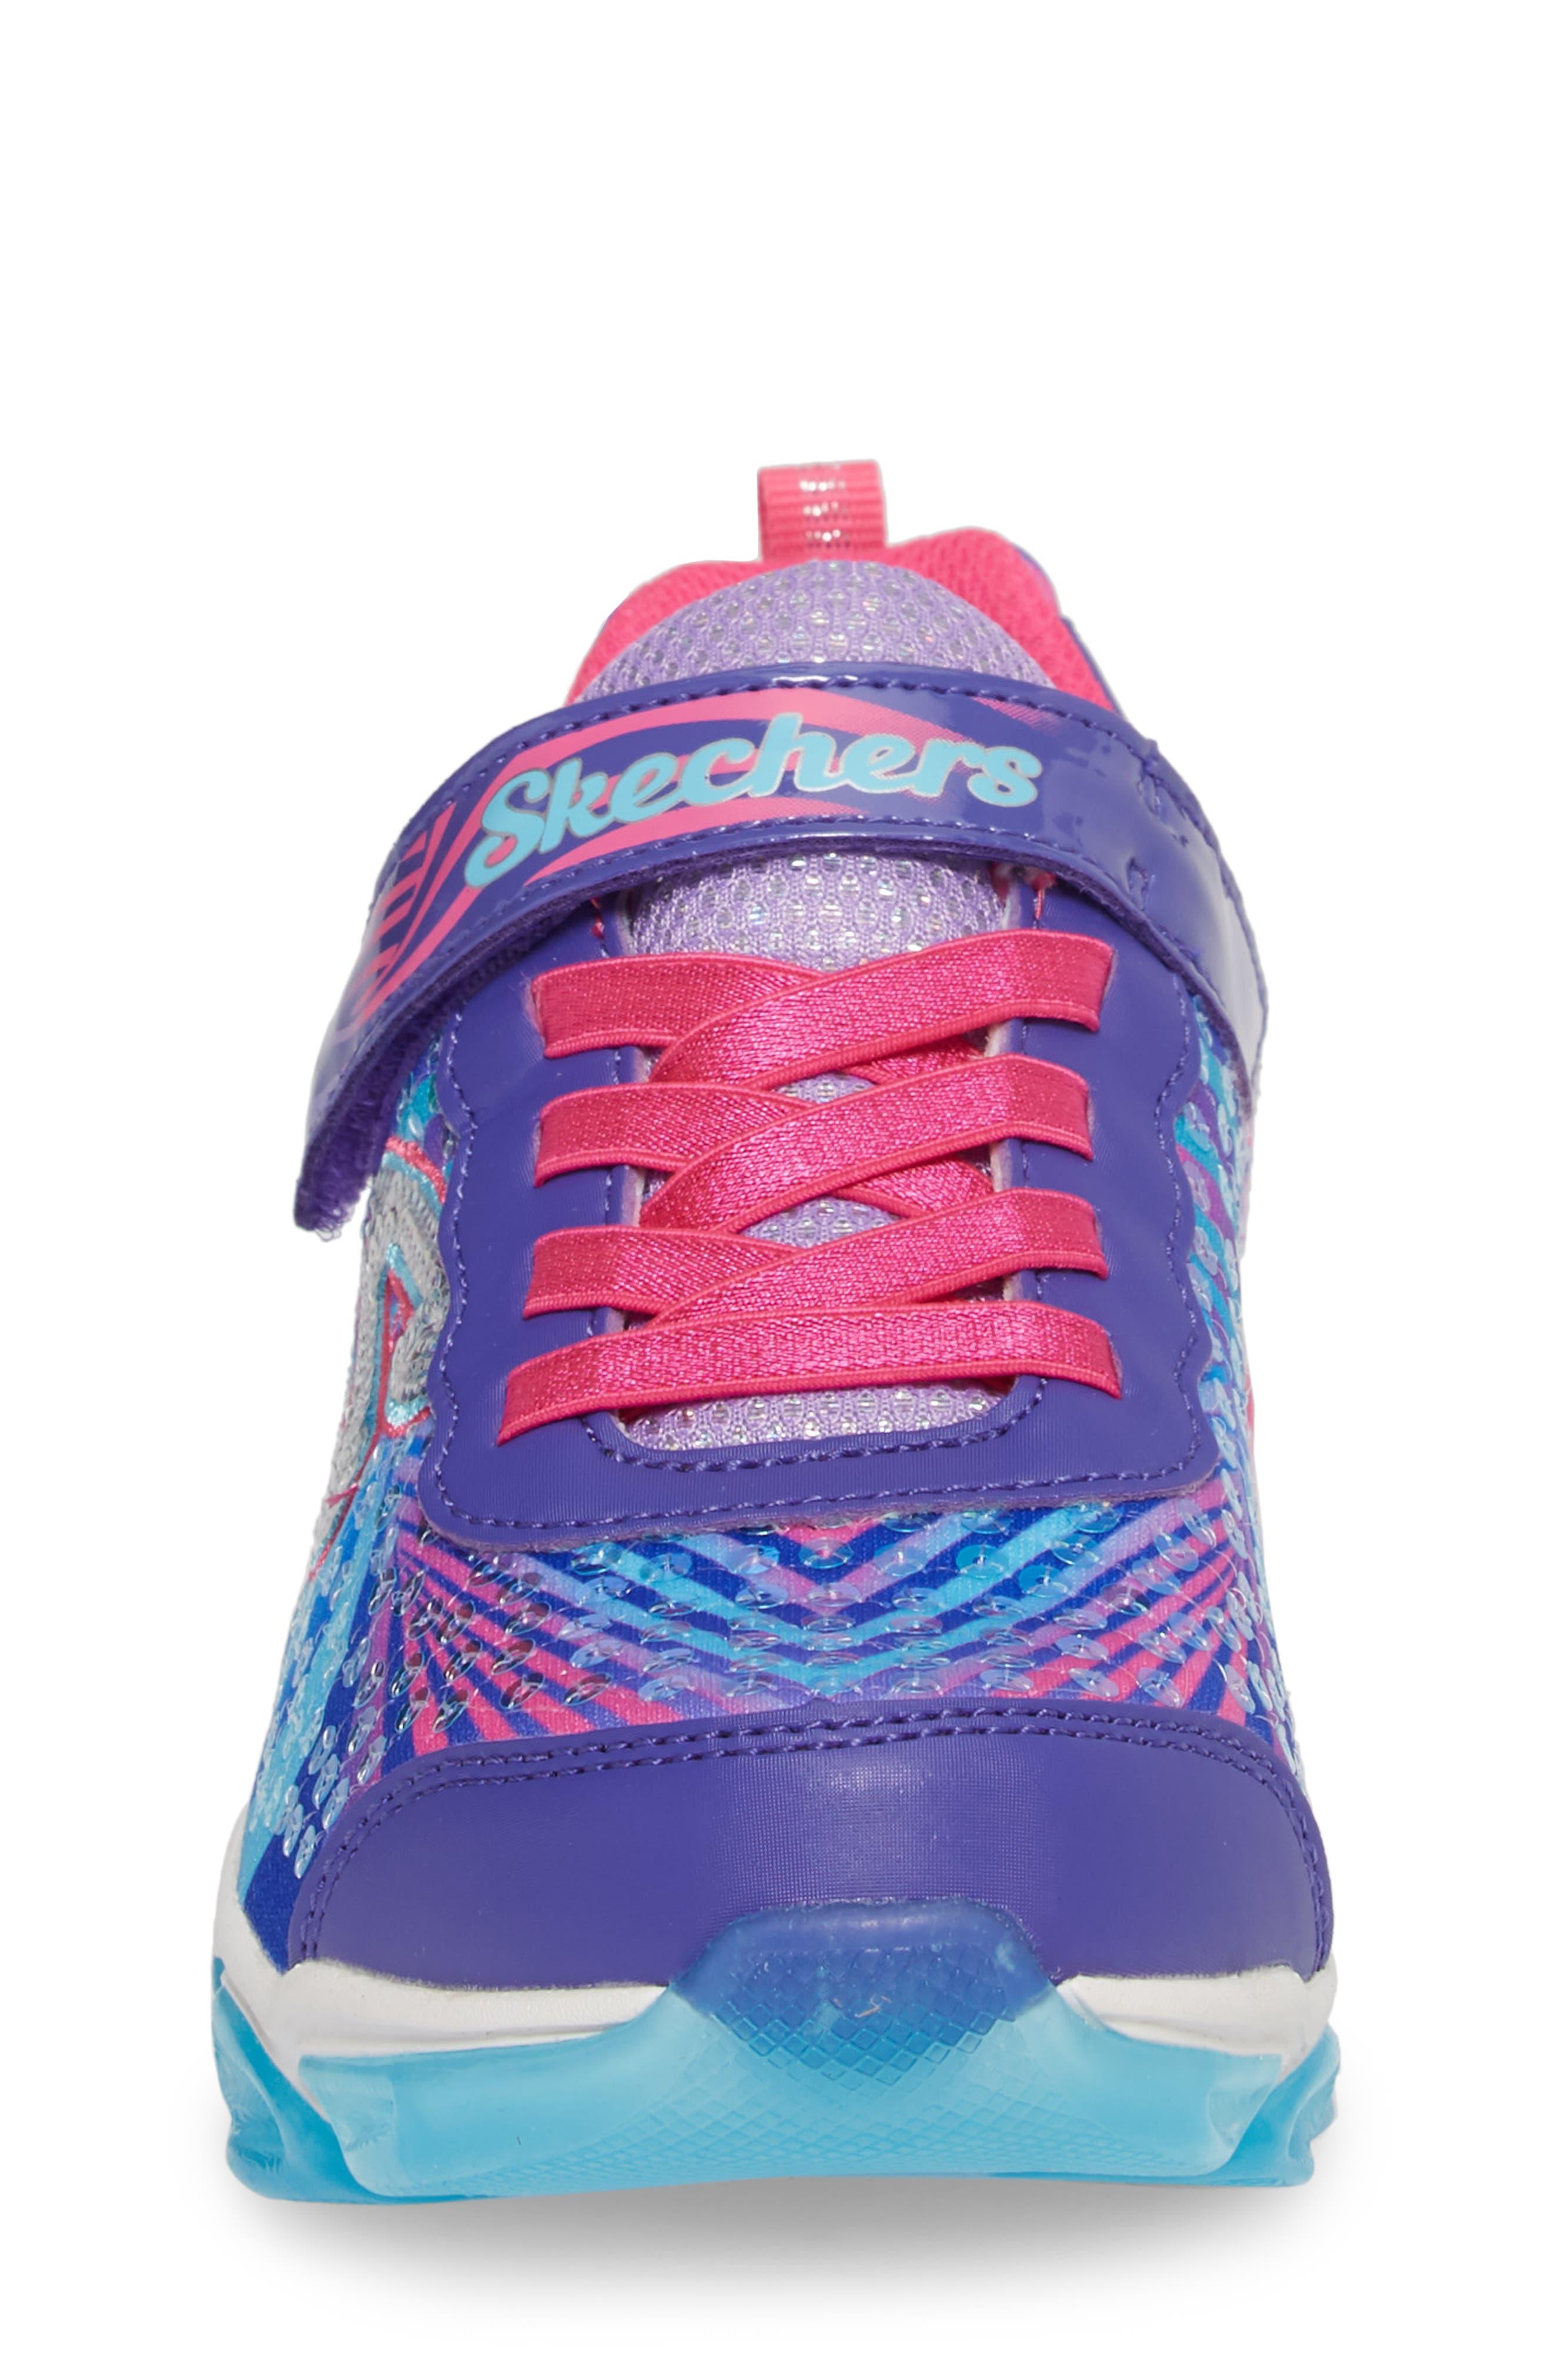 Jelly Beams Light-Up Sneaker,                             Alternate thumbnail 4, color,                             Purple/ Multi